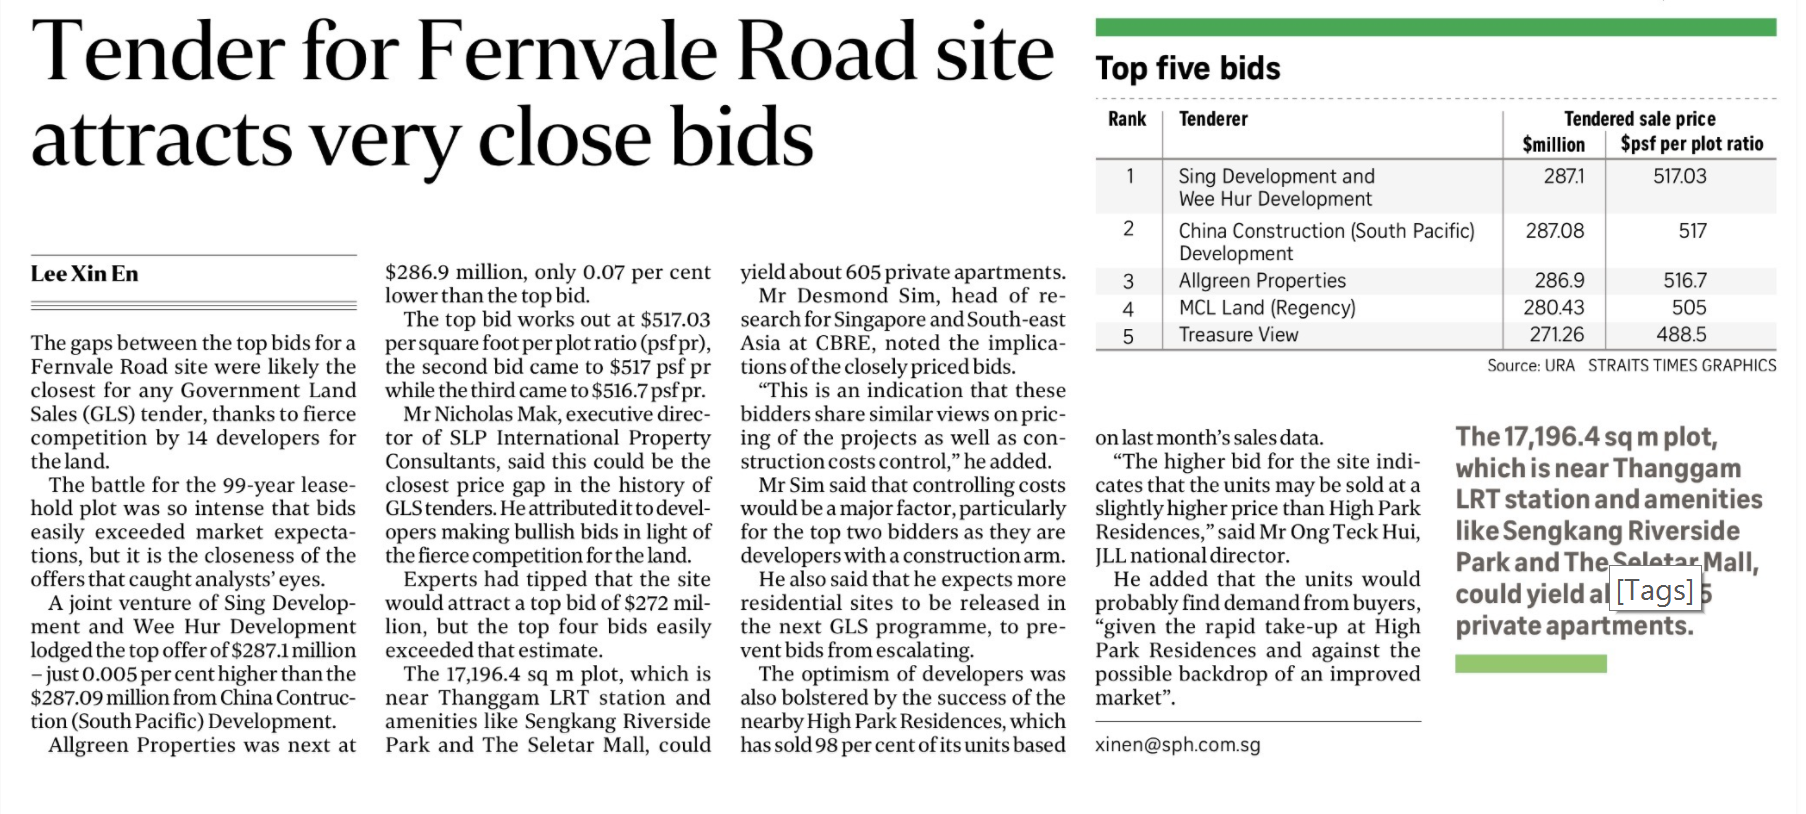 Fernvale Tender Land Prices